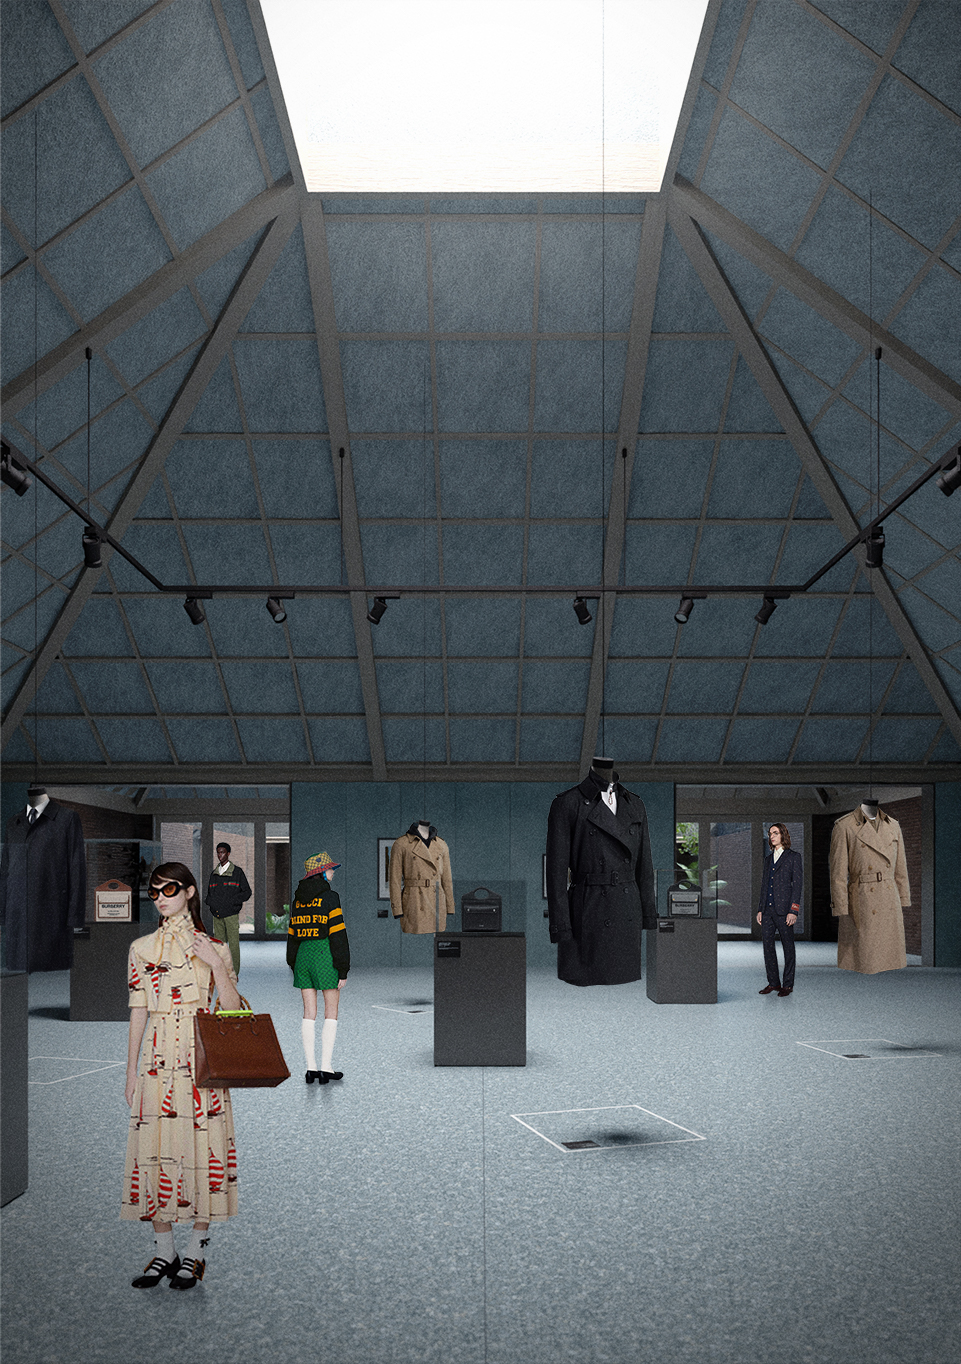 Exhibition space – Bromley Hall School